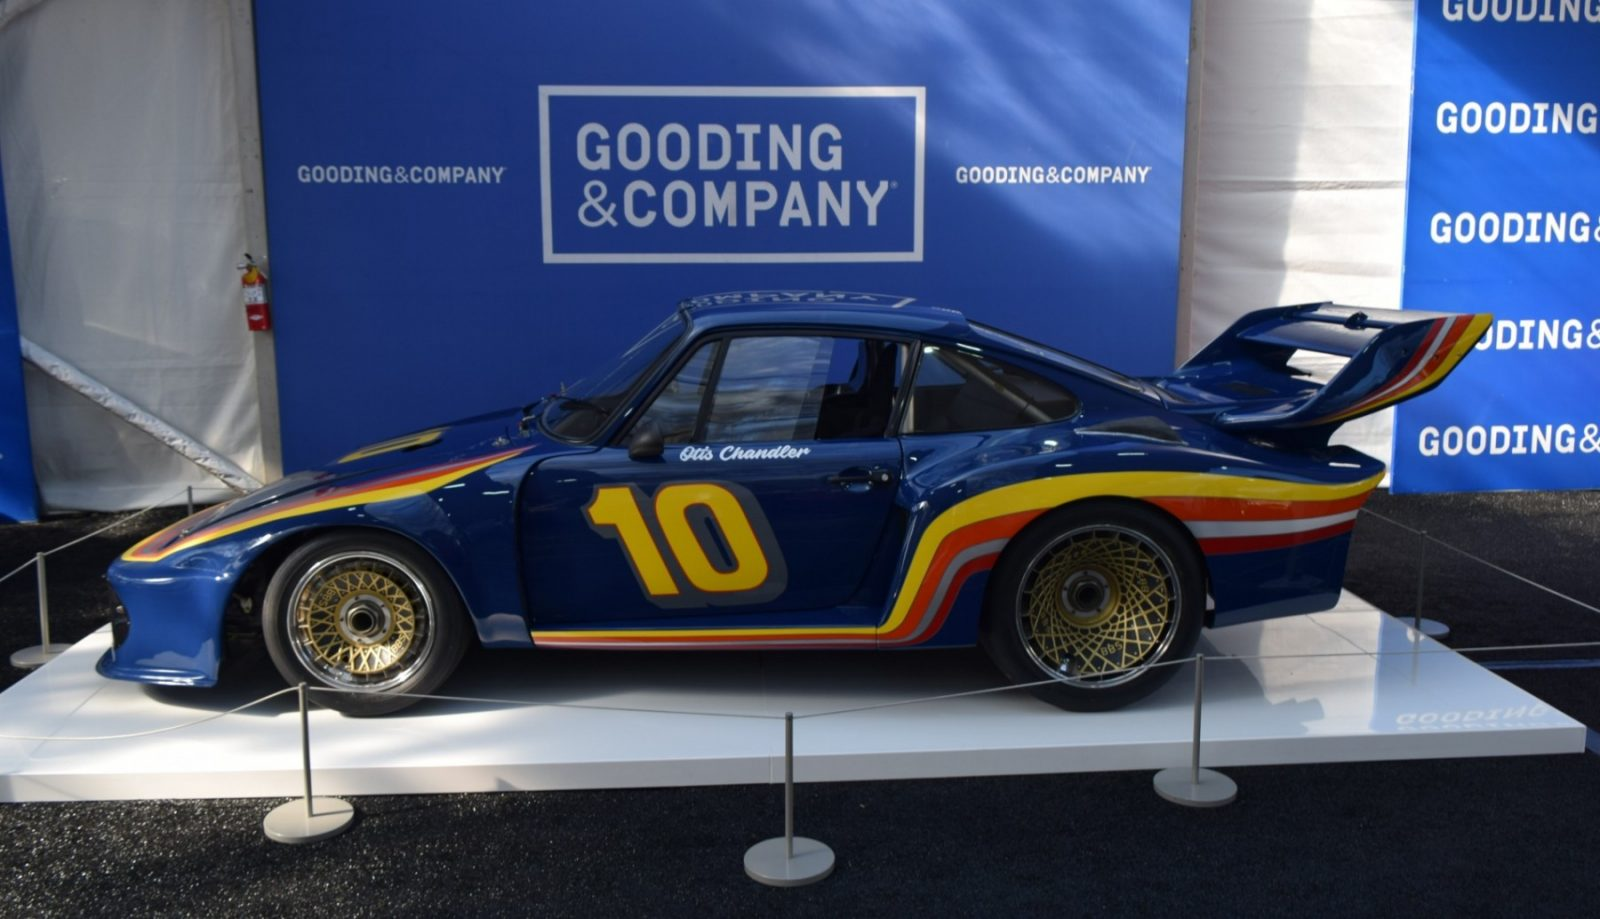 1979 Porsche 935 - Gooding Amelia 20192